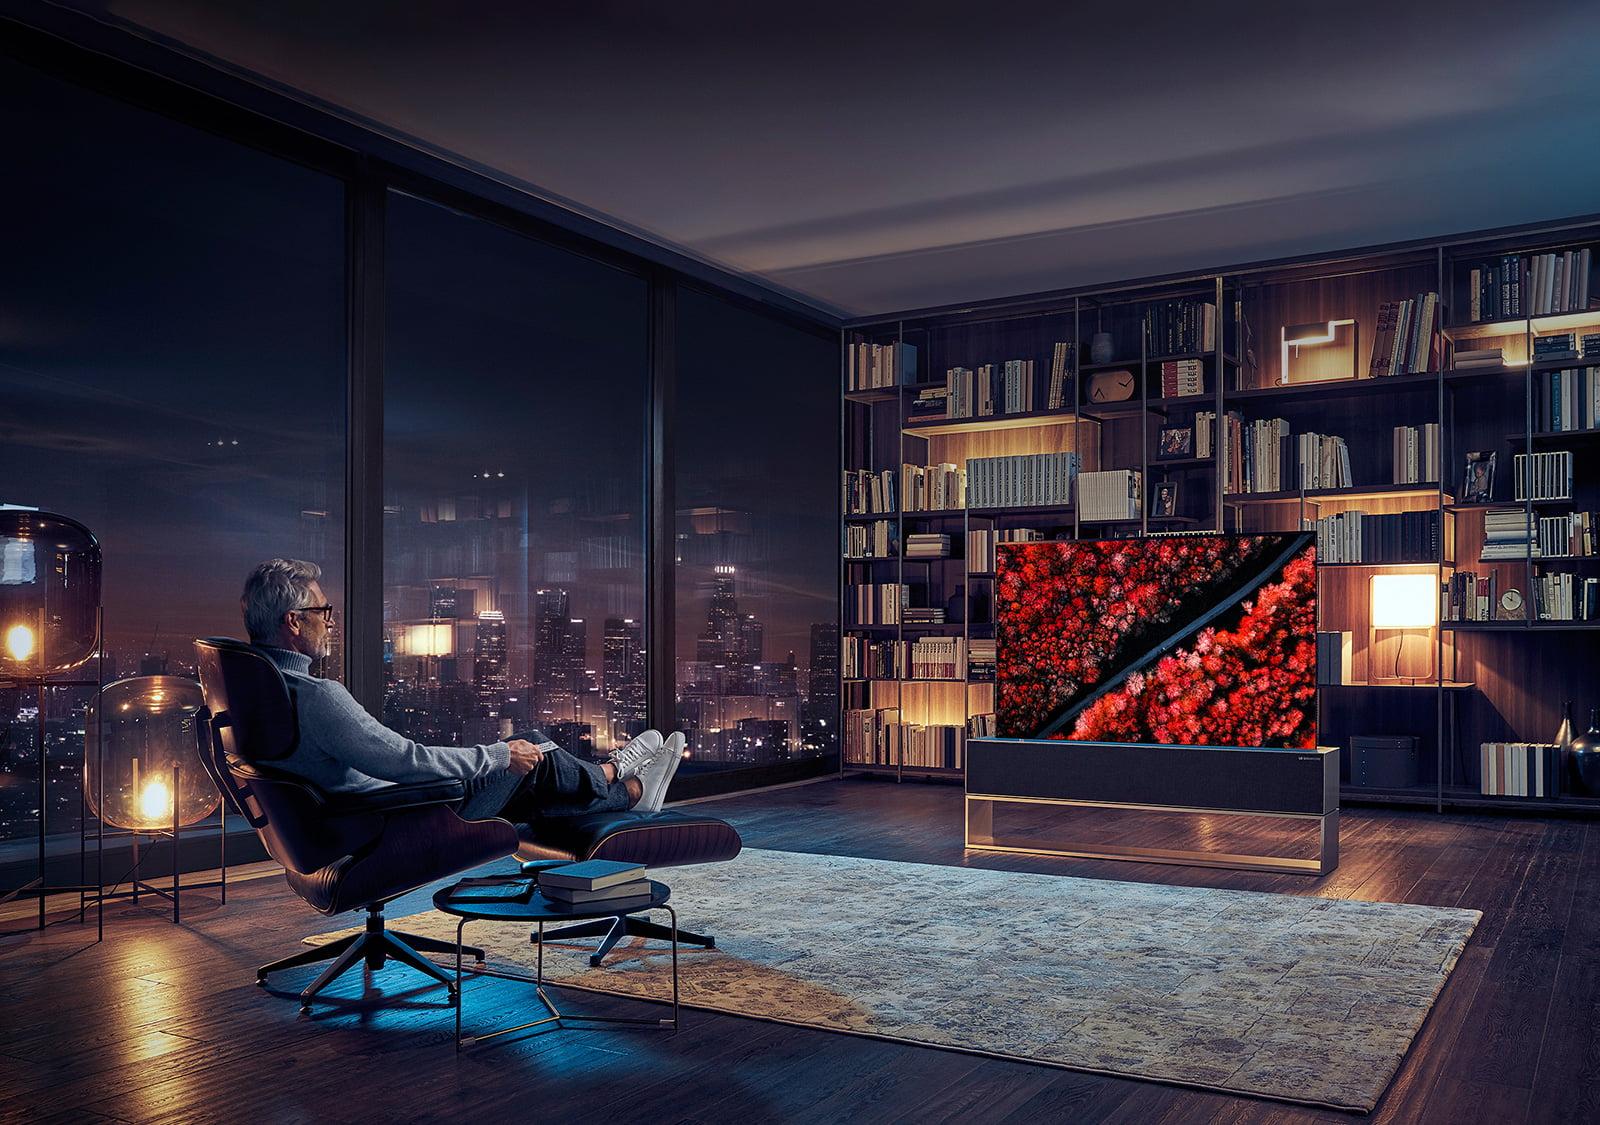 LG full view TV